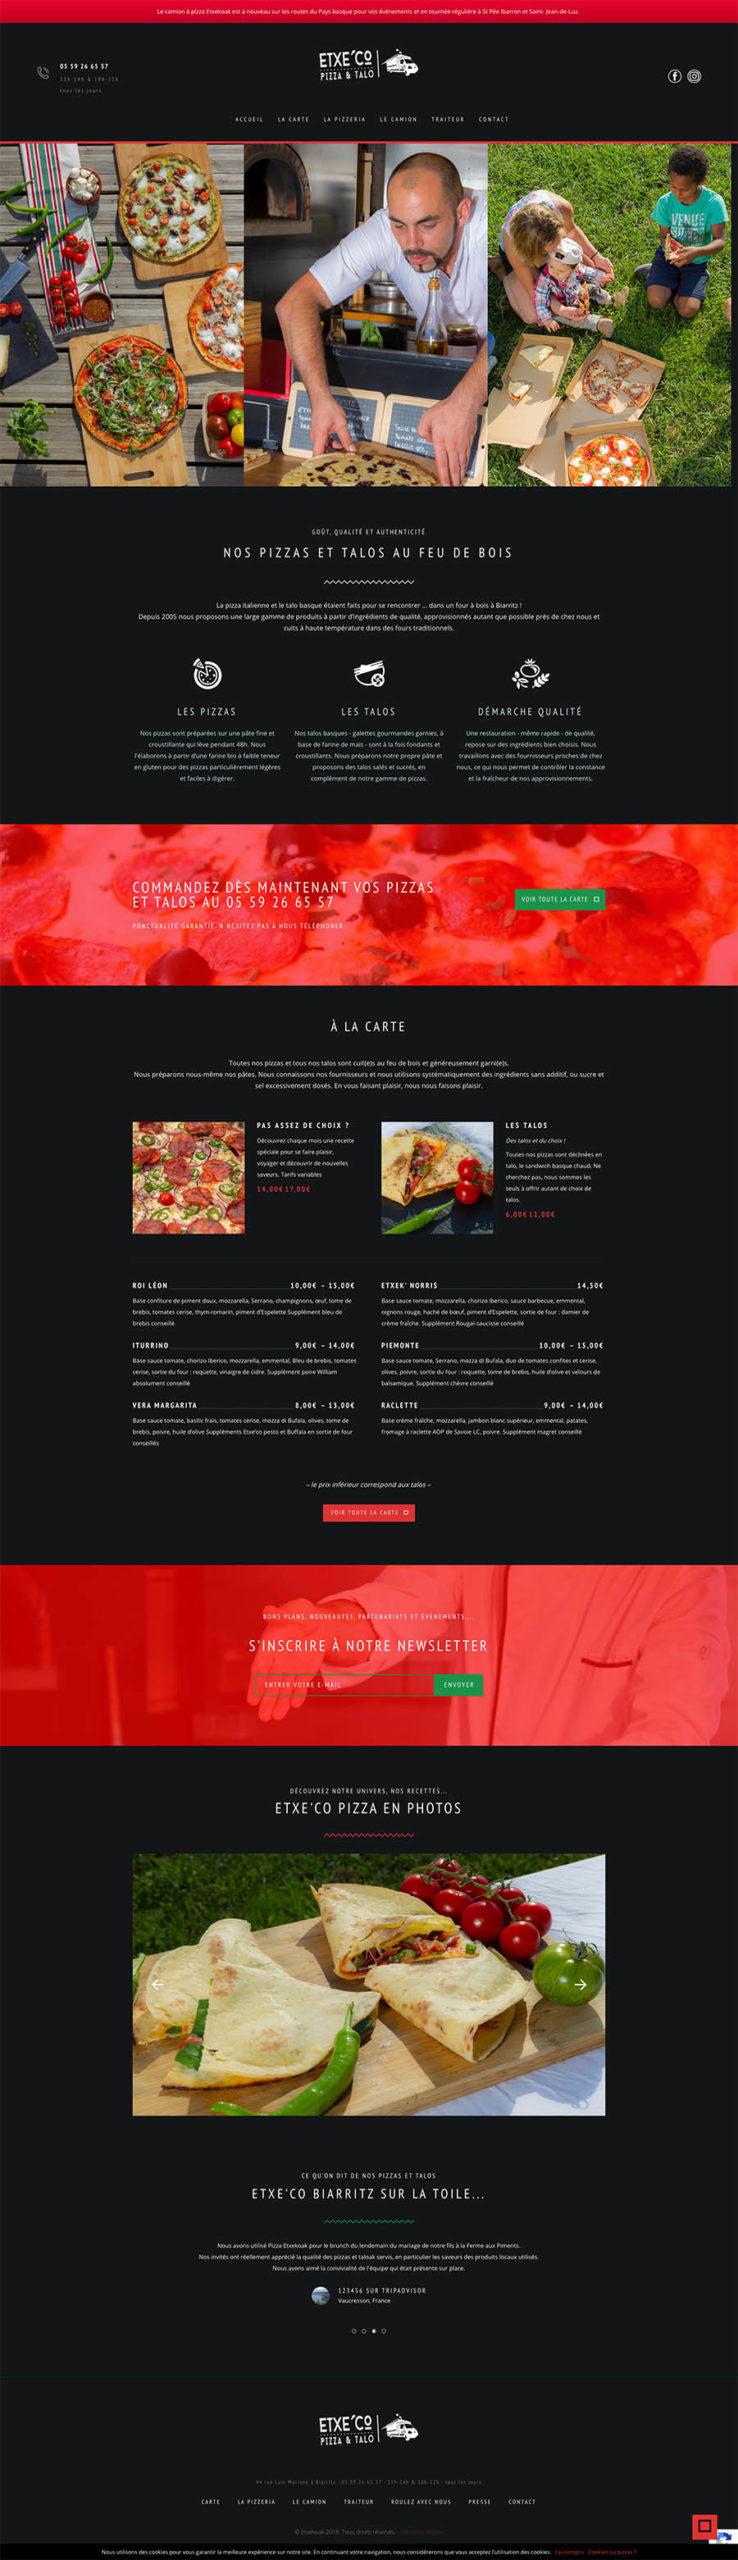 maquette-site-internet-etxeco-pizza-biarritz